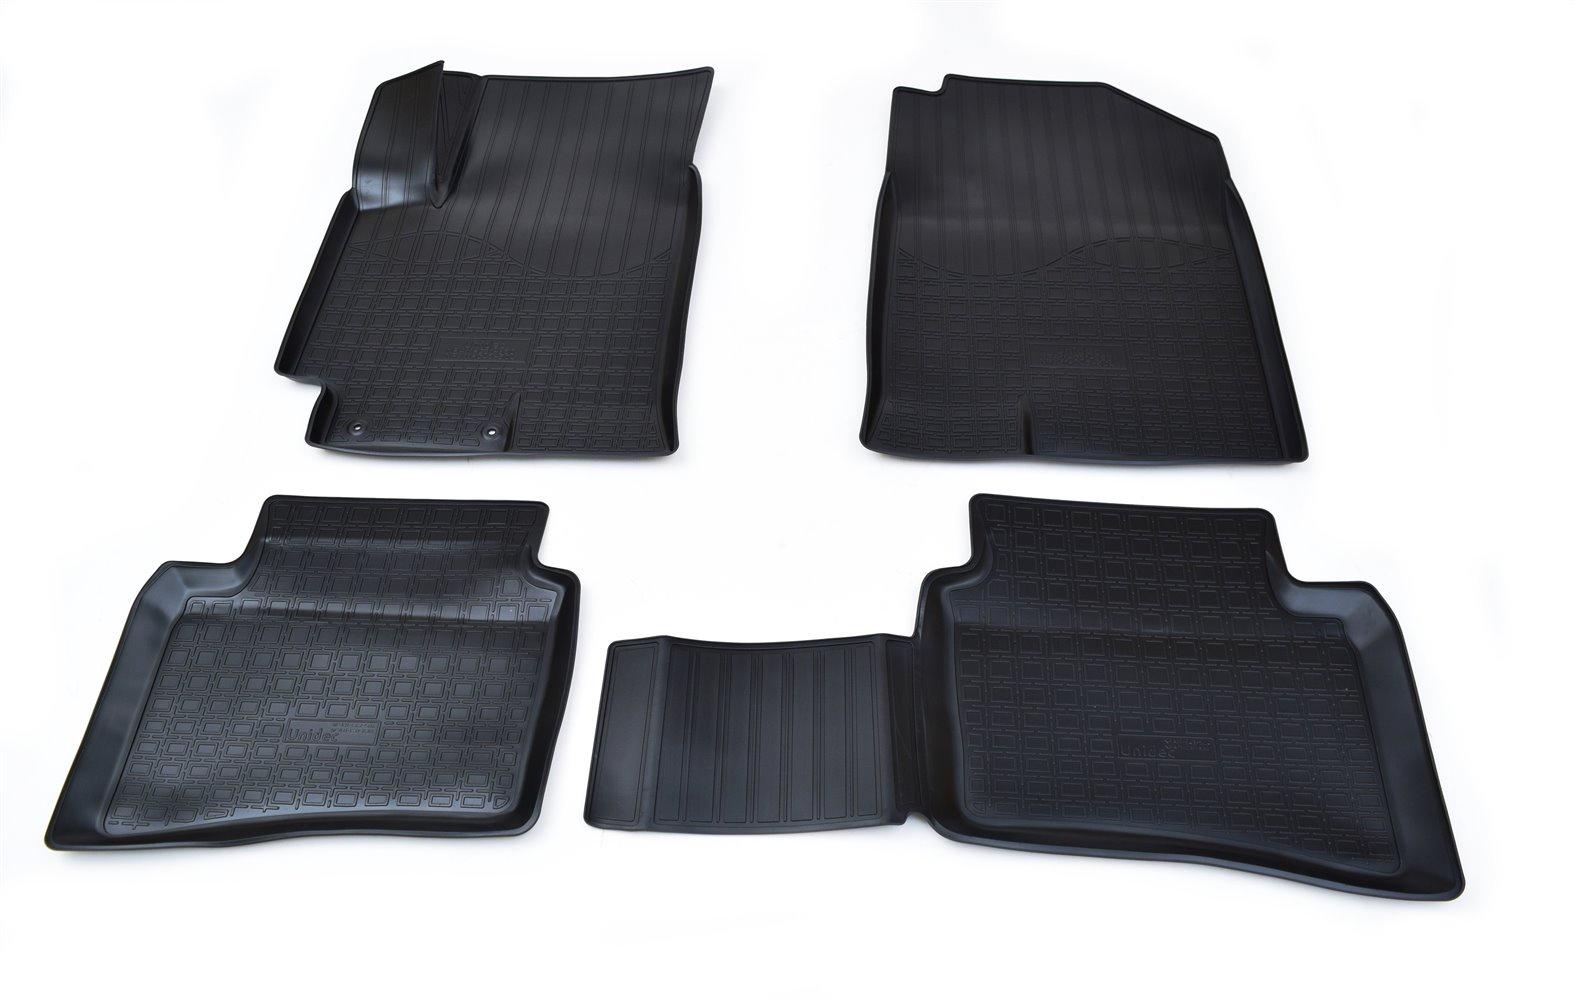 Коврики в салон автомобиля Norplast для Kia Rio (FB) 3D (2017), NPA11-C43-504, черный коврики салона и багажного отсека комплект на автомобиль резиновые для комплектаций prestige и premium hyundai kia r8130h0100p для kia rio 2017